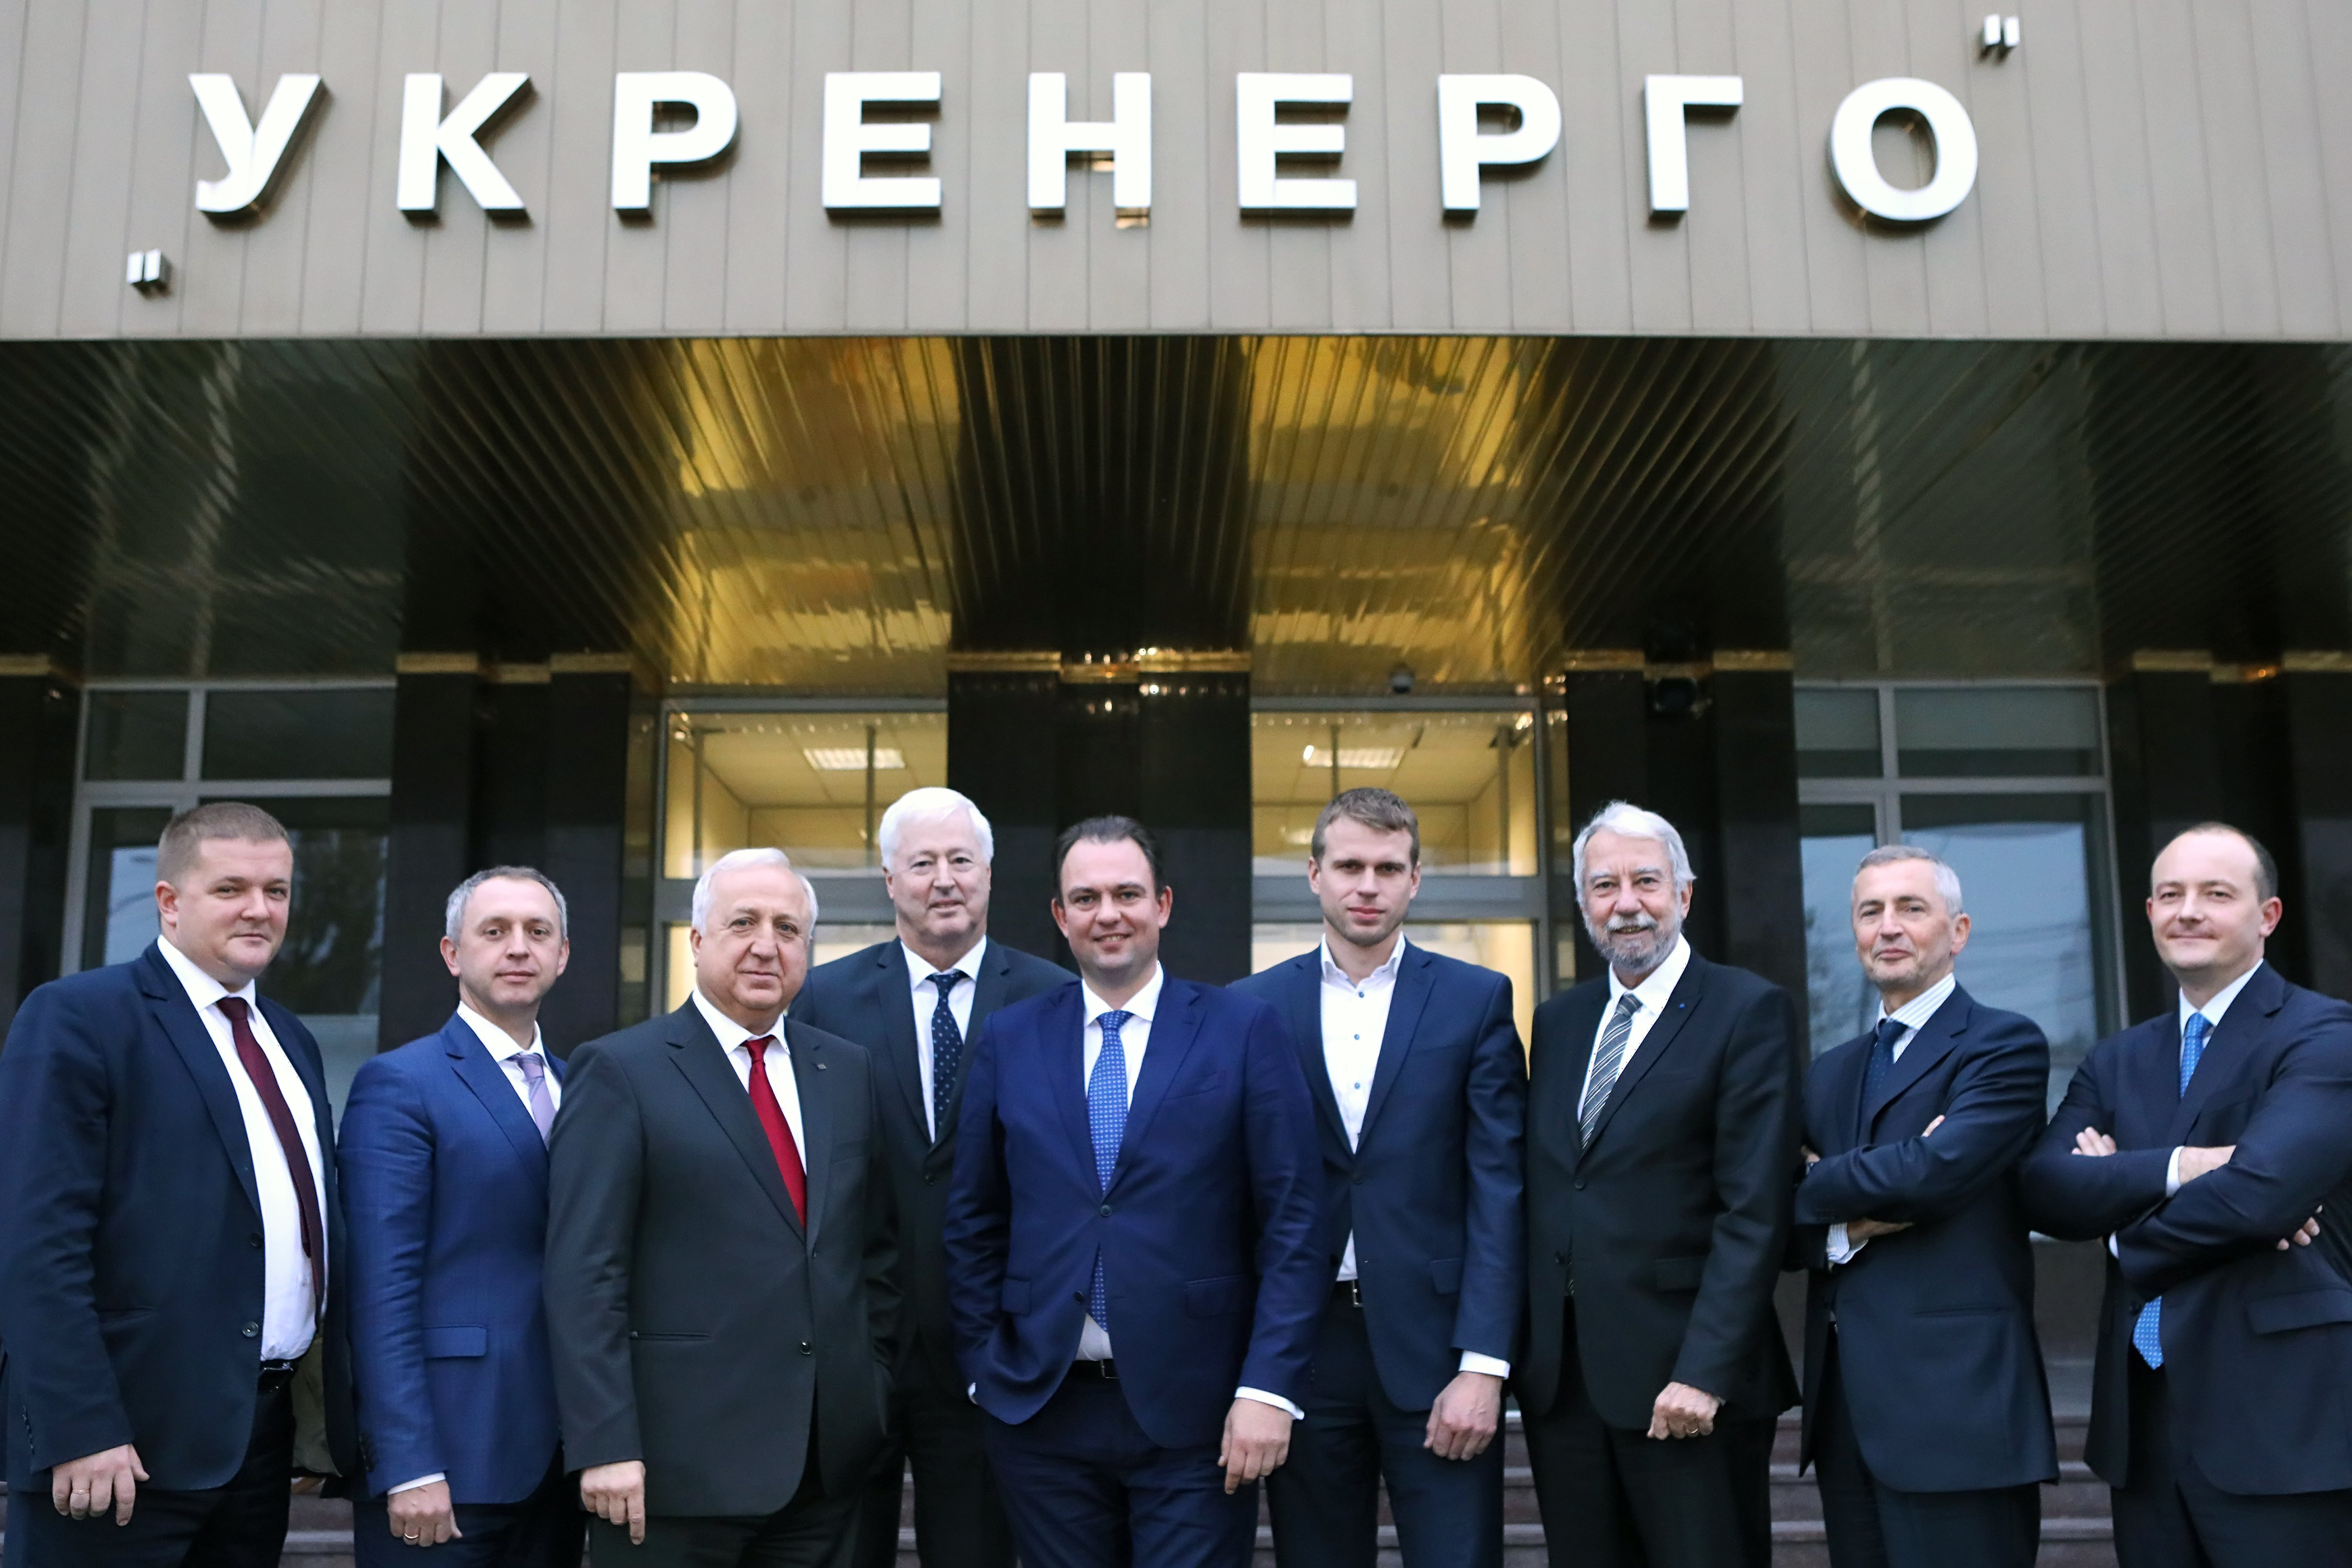 Коррупционная «кормушка»: как «Укрэнерго» шантажирует малый бизнес